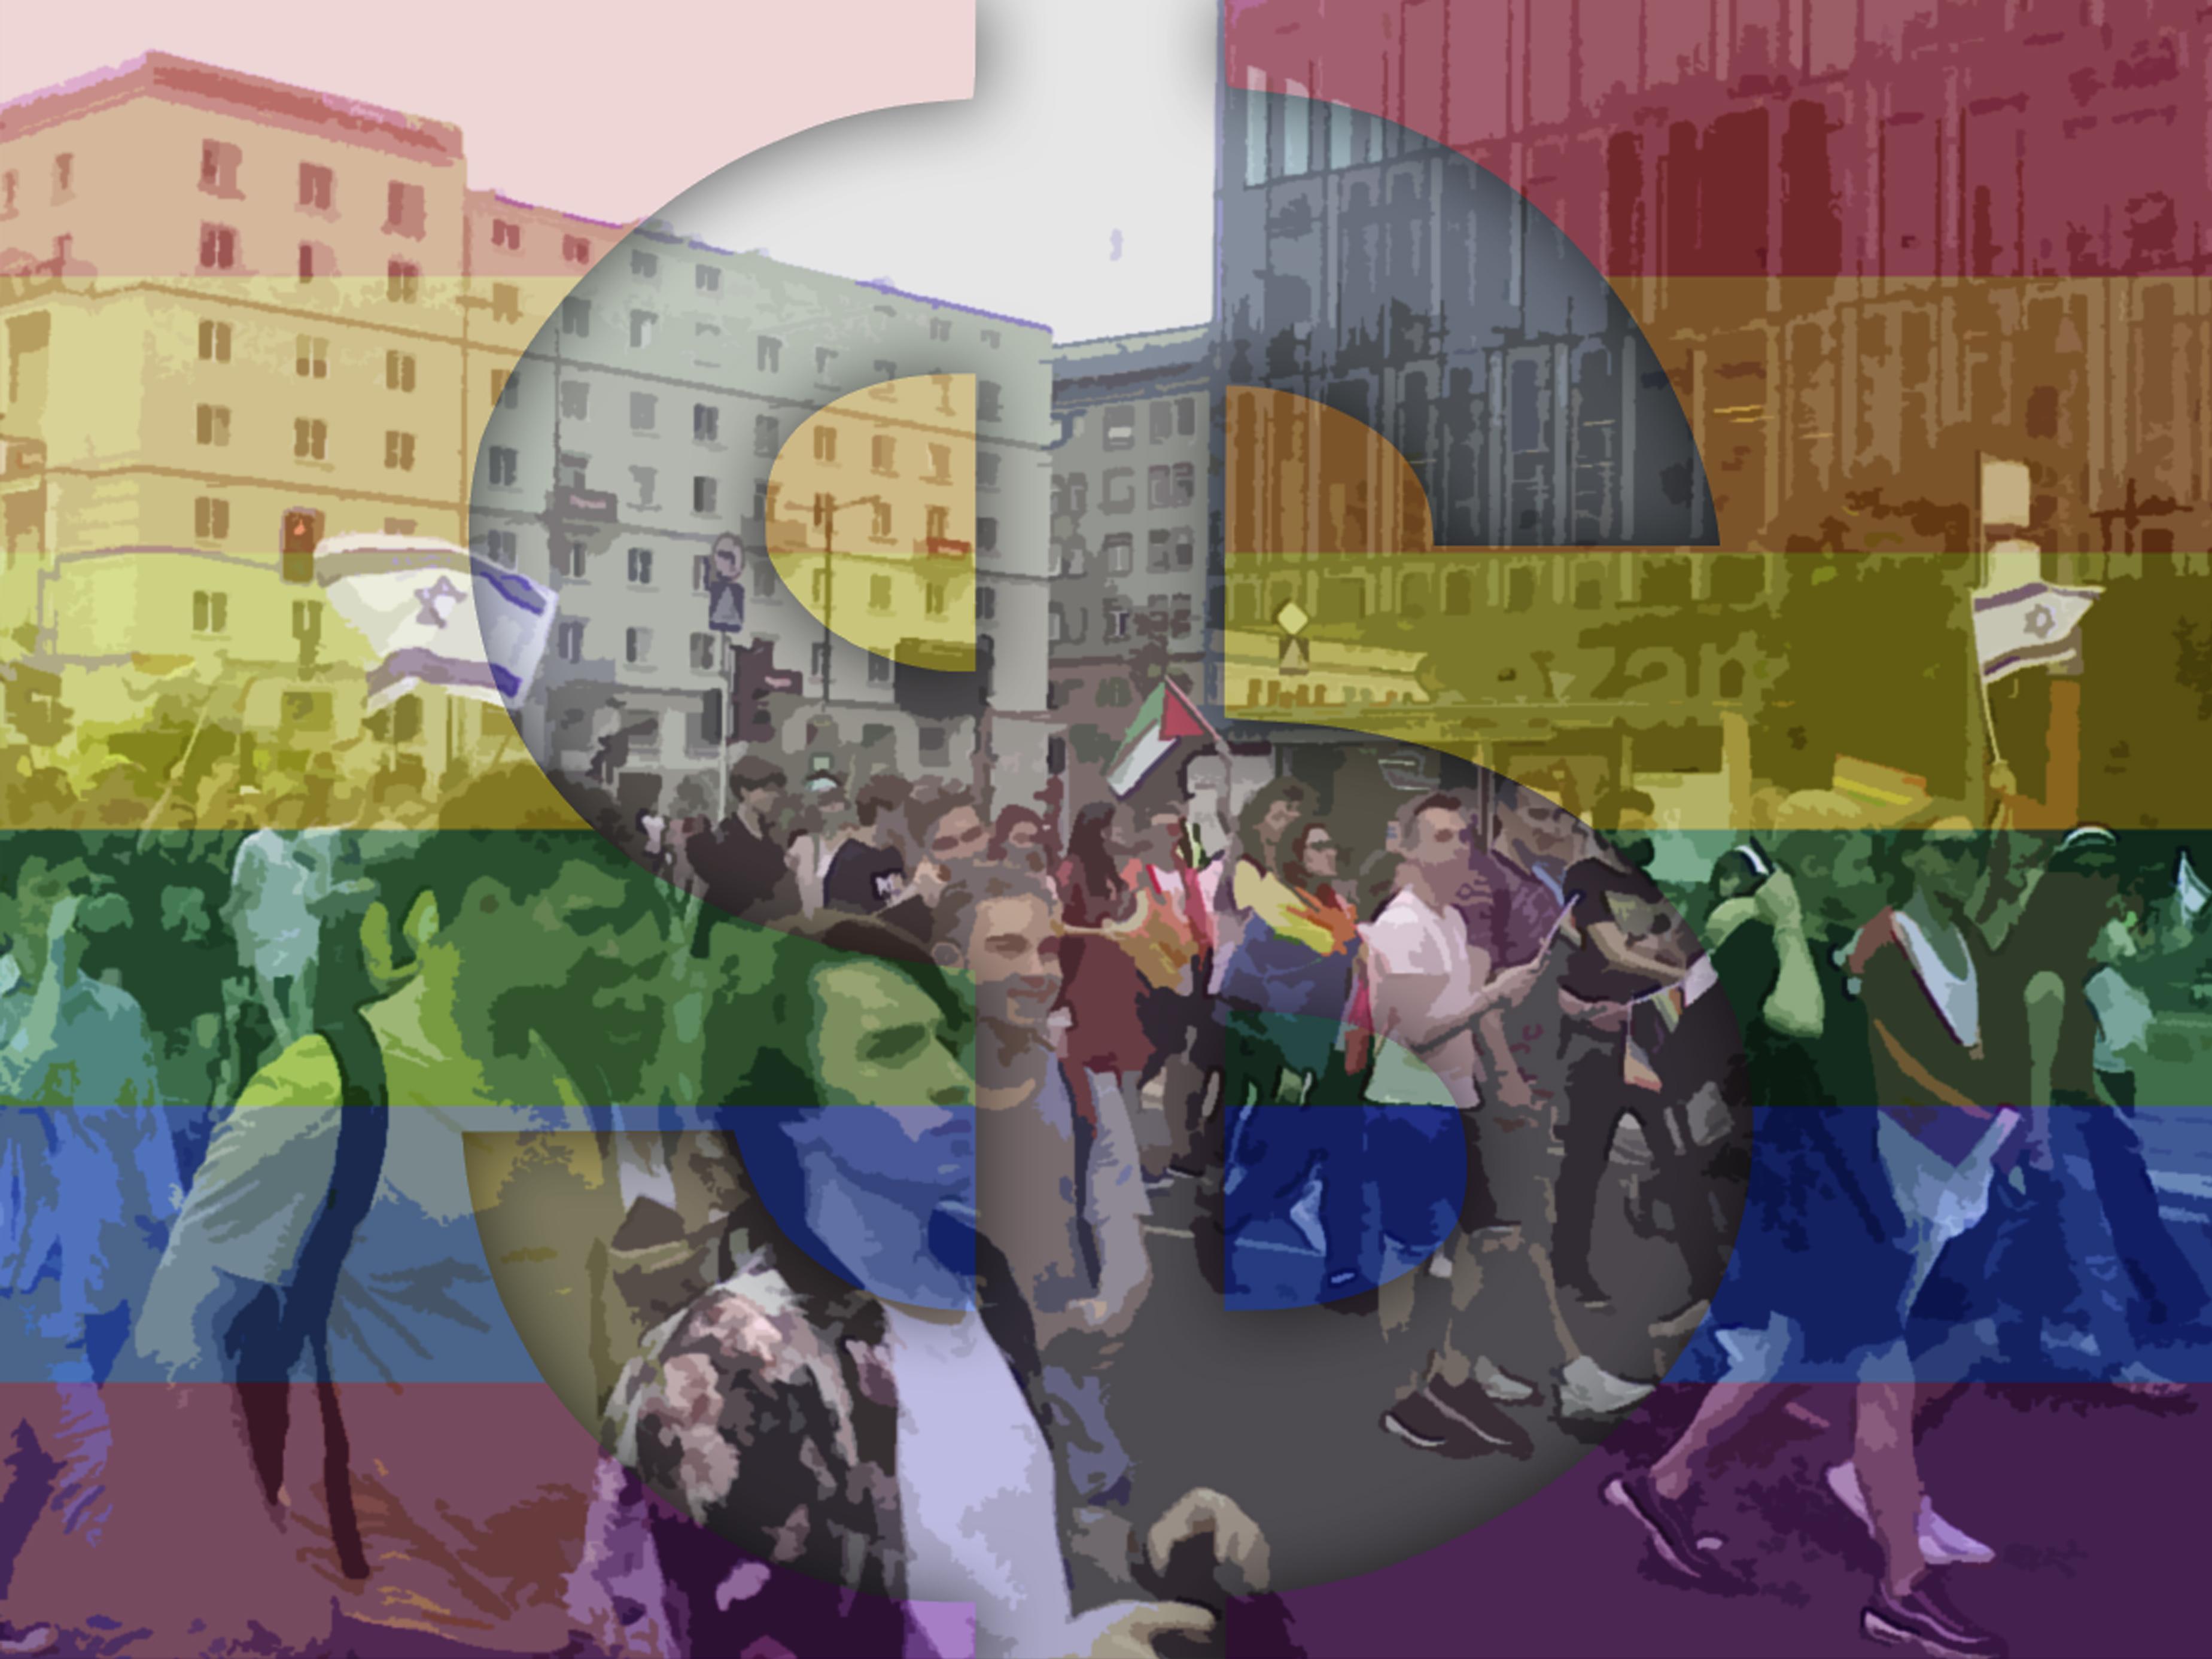 Londyn klucze seks lesbijski